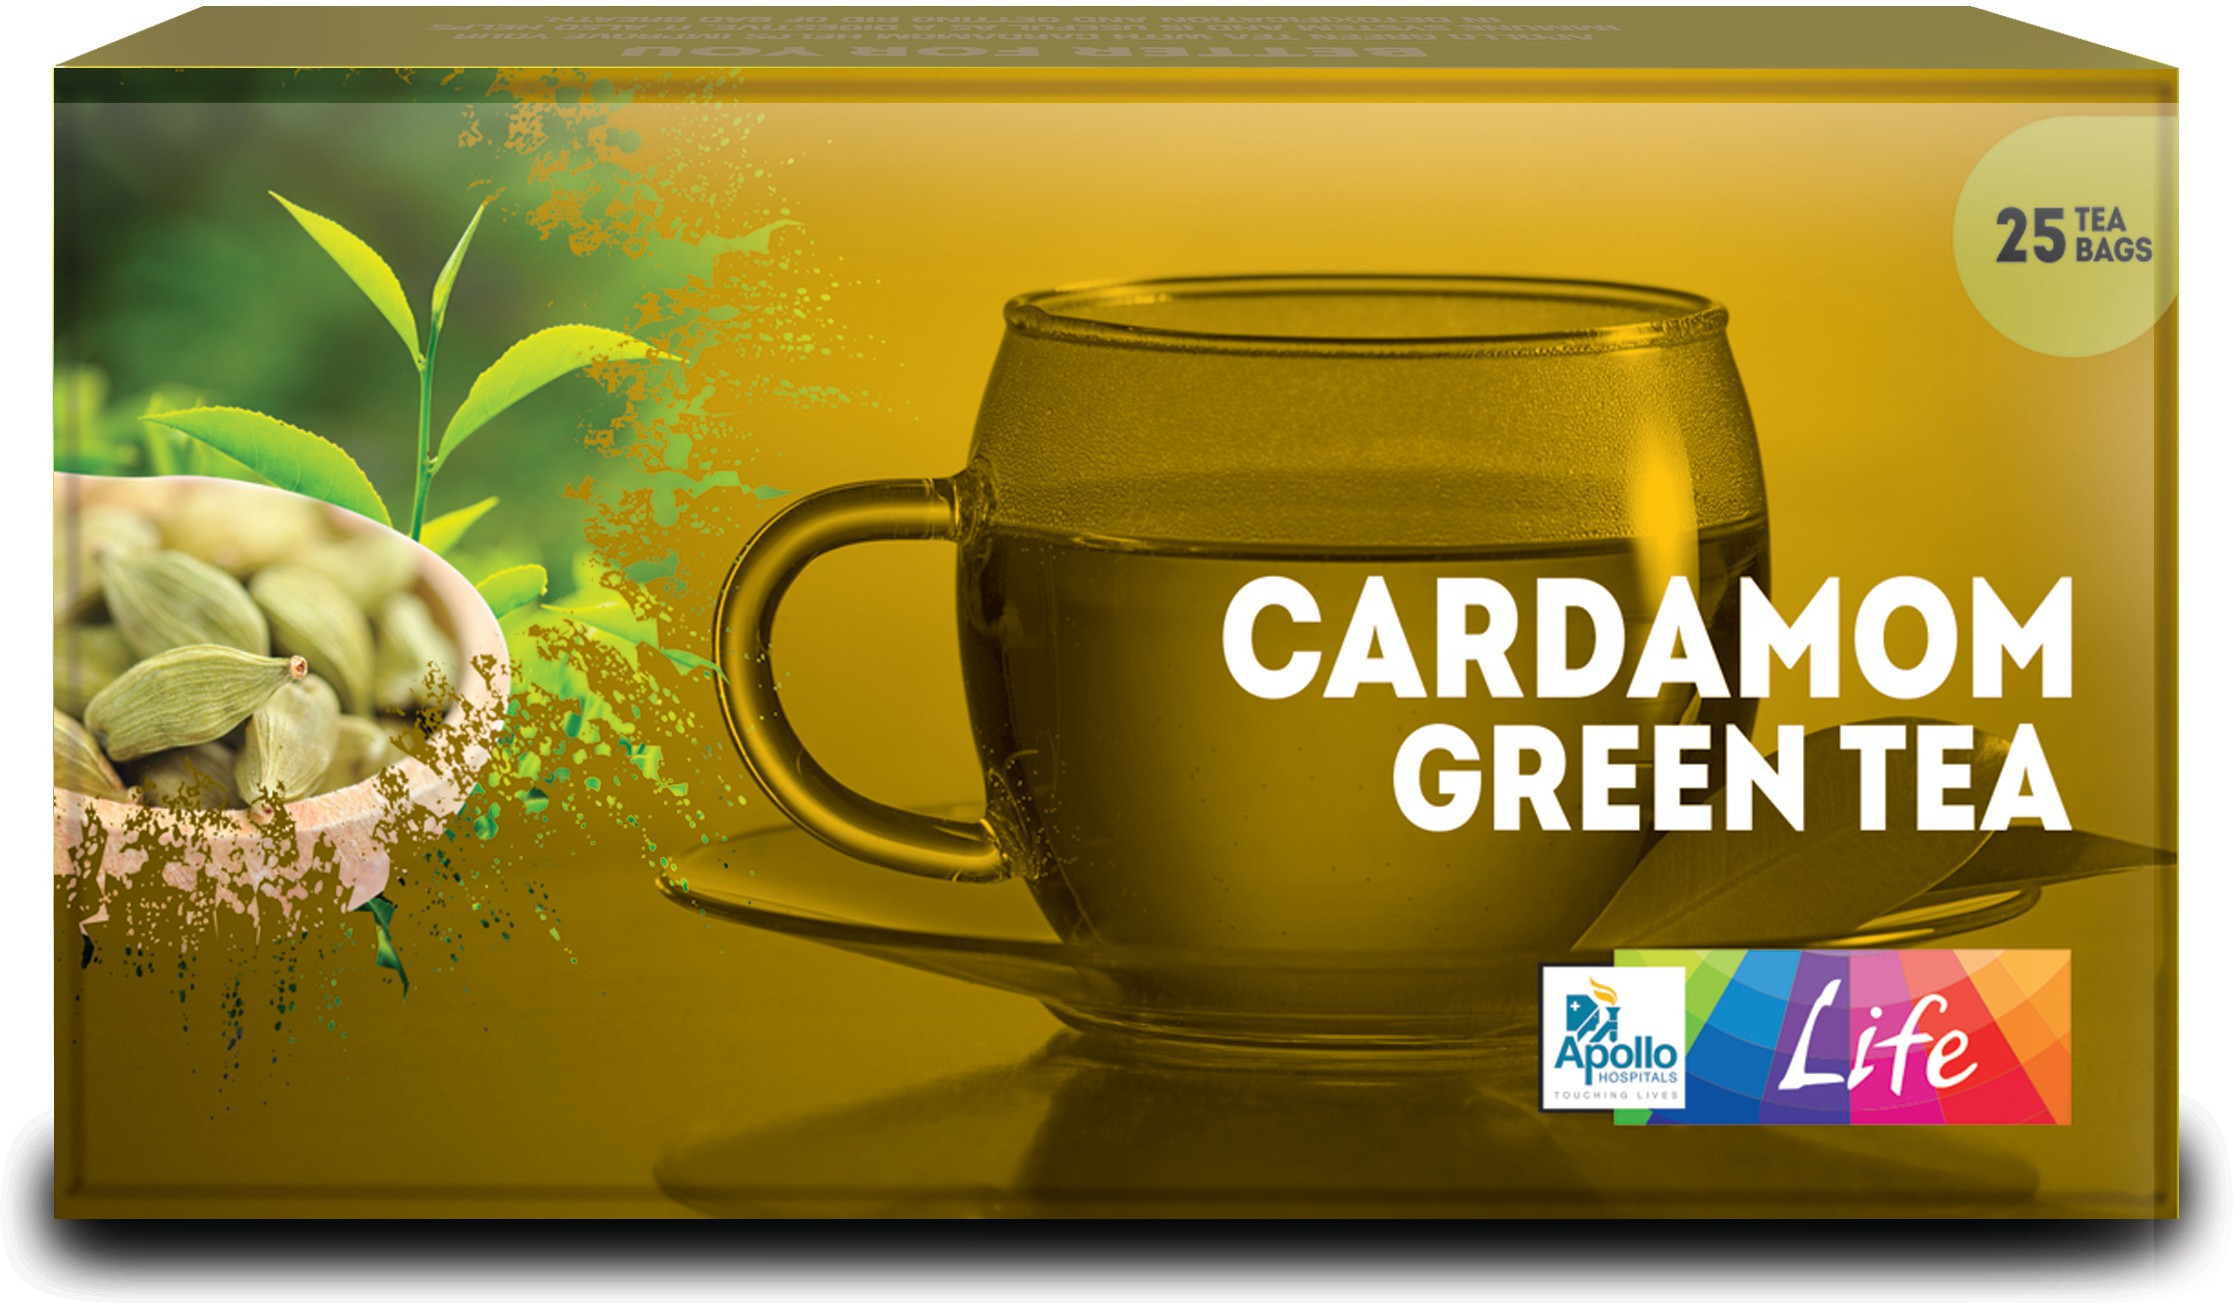 Apollo Pharmacy Cardamom Green Tea